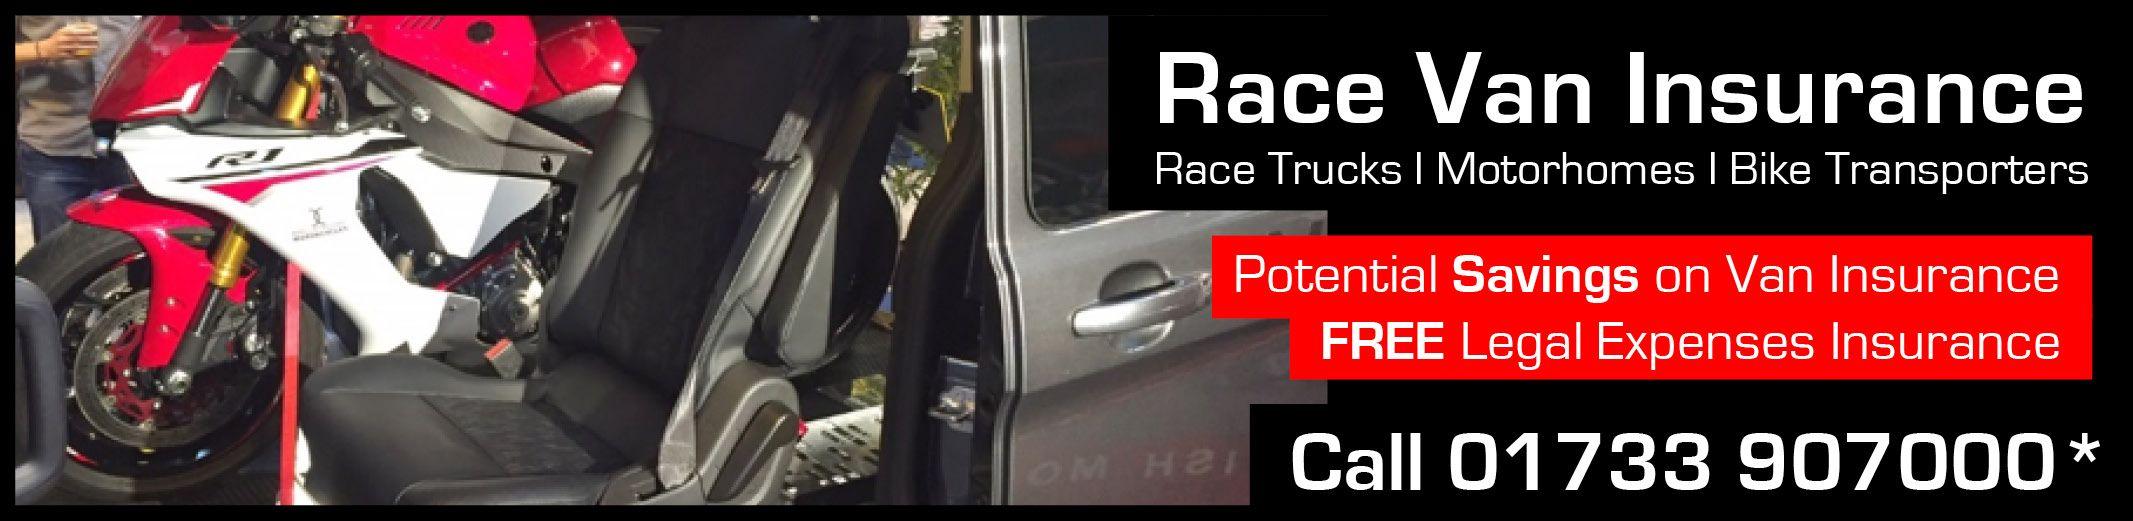 Race Van Insurance